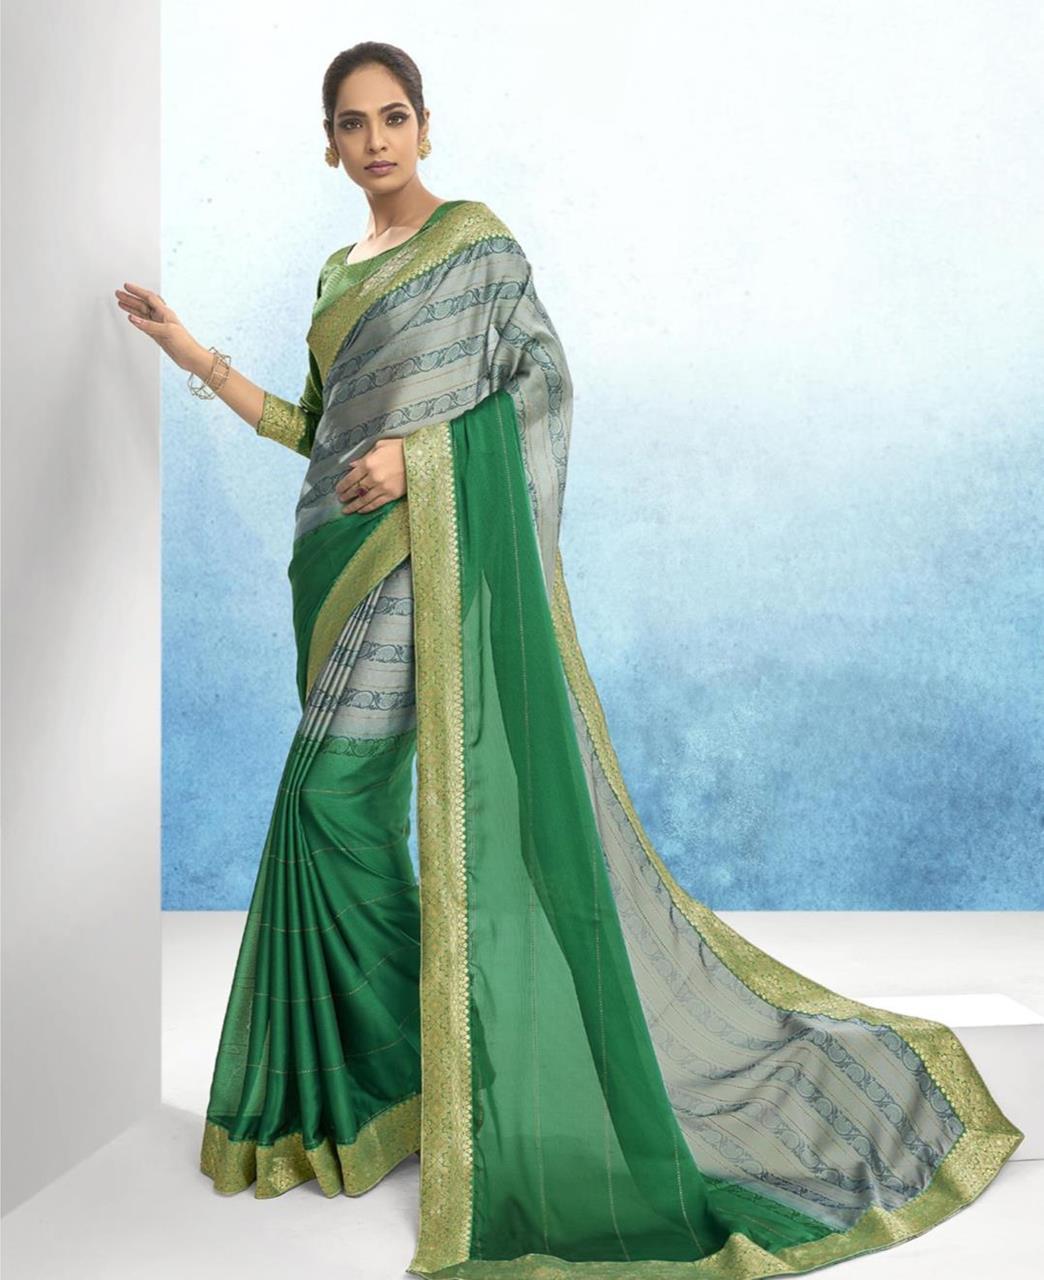 Lace Chiffon Saree in Light Green